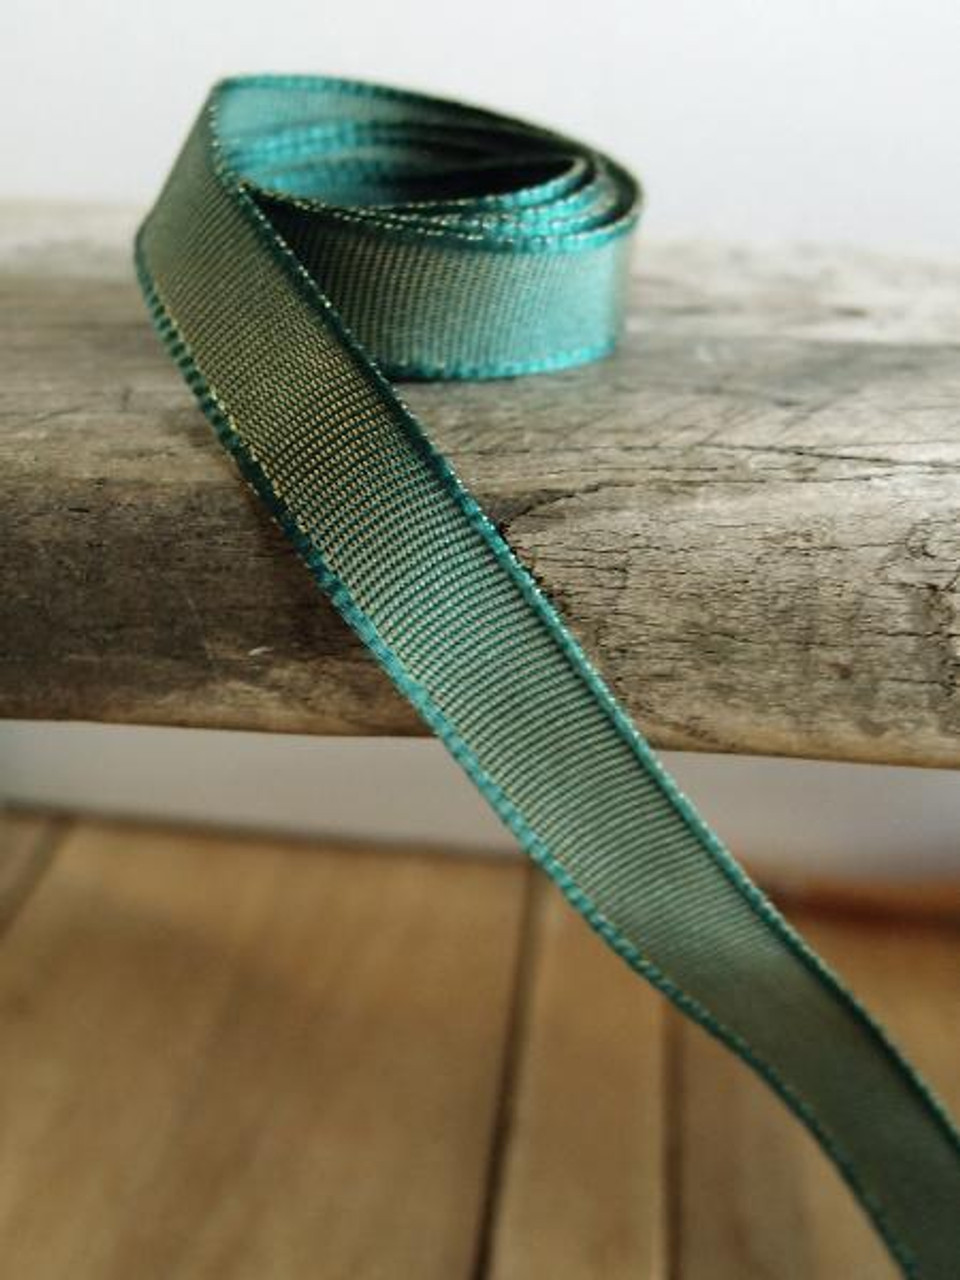 Hunter Green Two-Toned Grosgrain Ribbon (2 sizes)